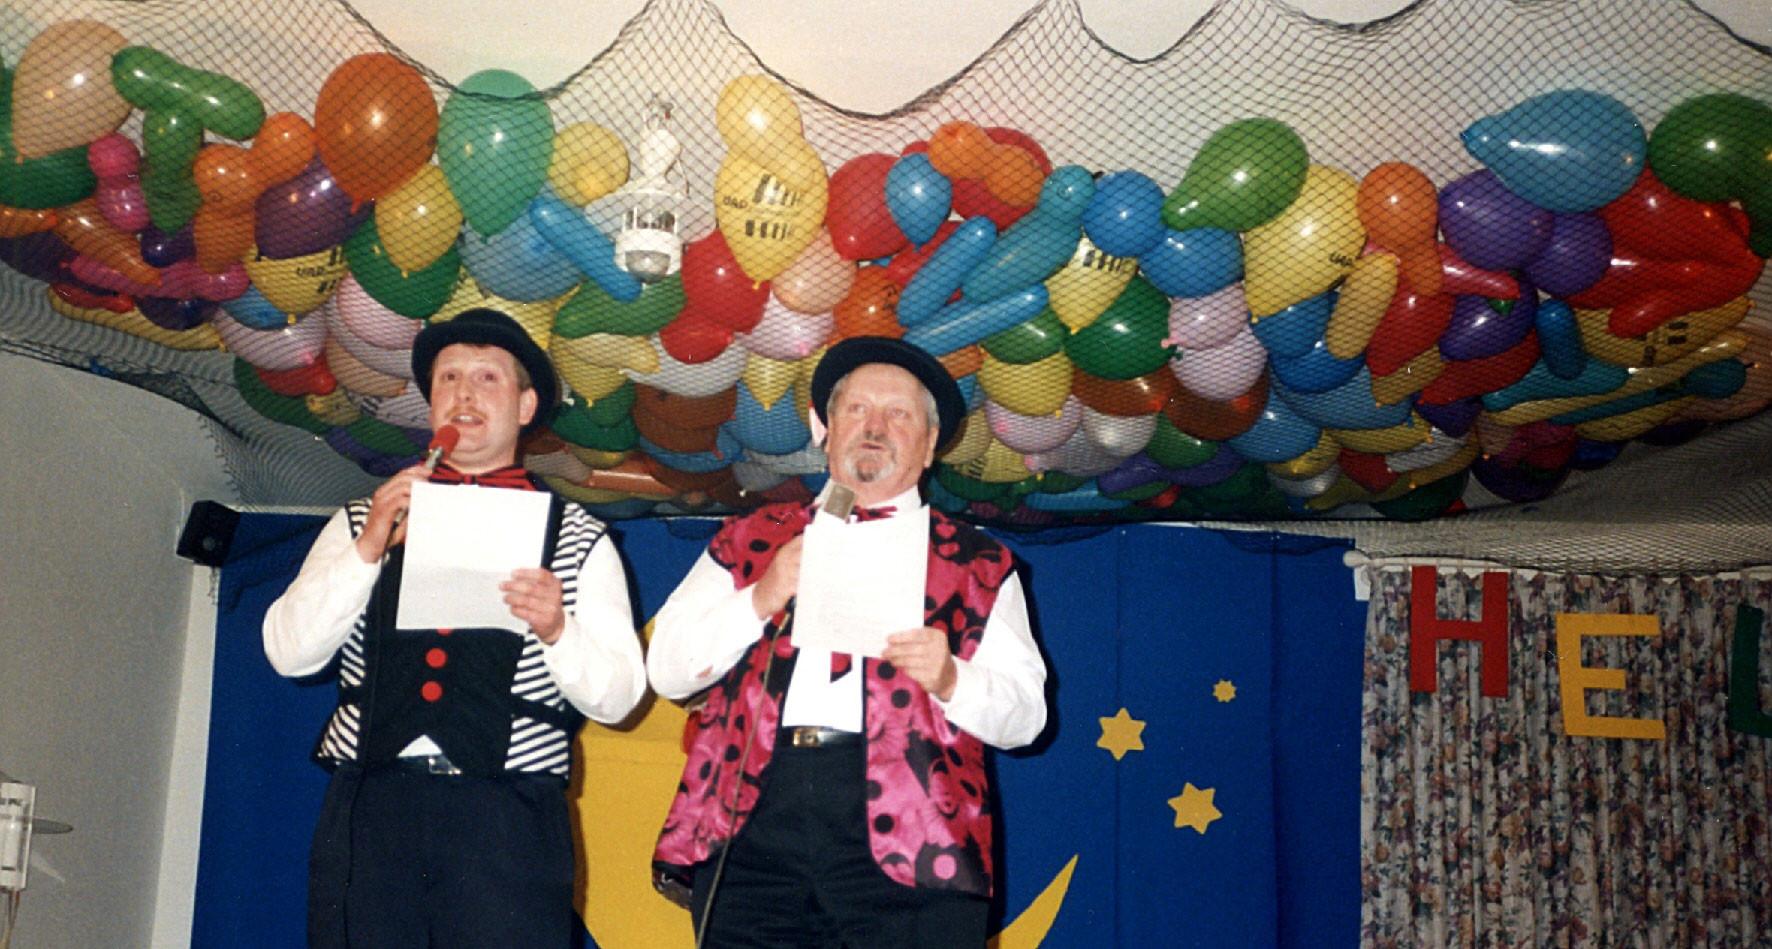 051-Deuselbach-1989-Rolf-Kube-(401).jpg